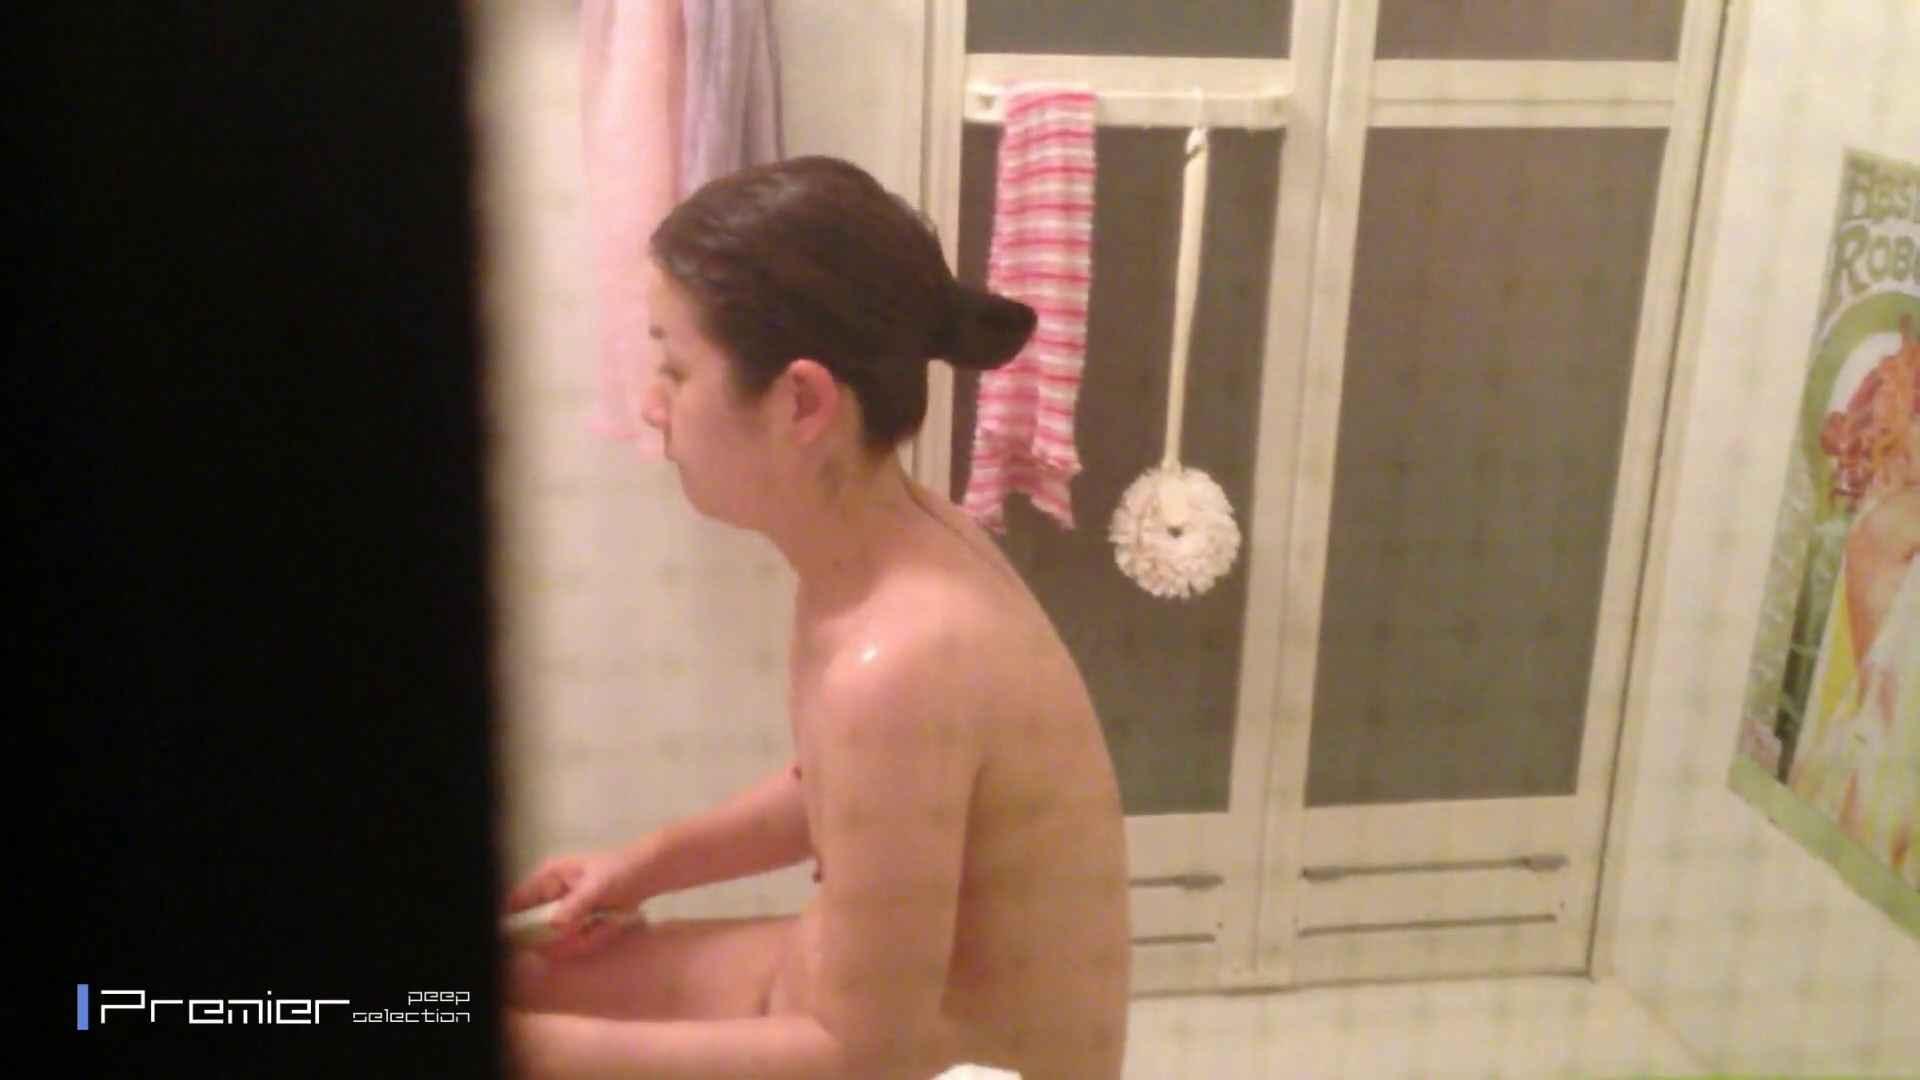 臨場感抜群!美人 OL の入浴シーン未公開版  美女達の私生活に潜入! 高評価  95枚 45